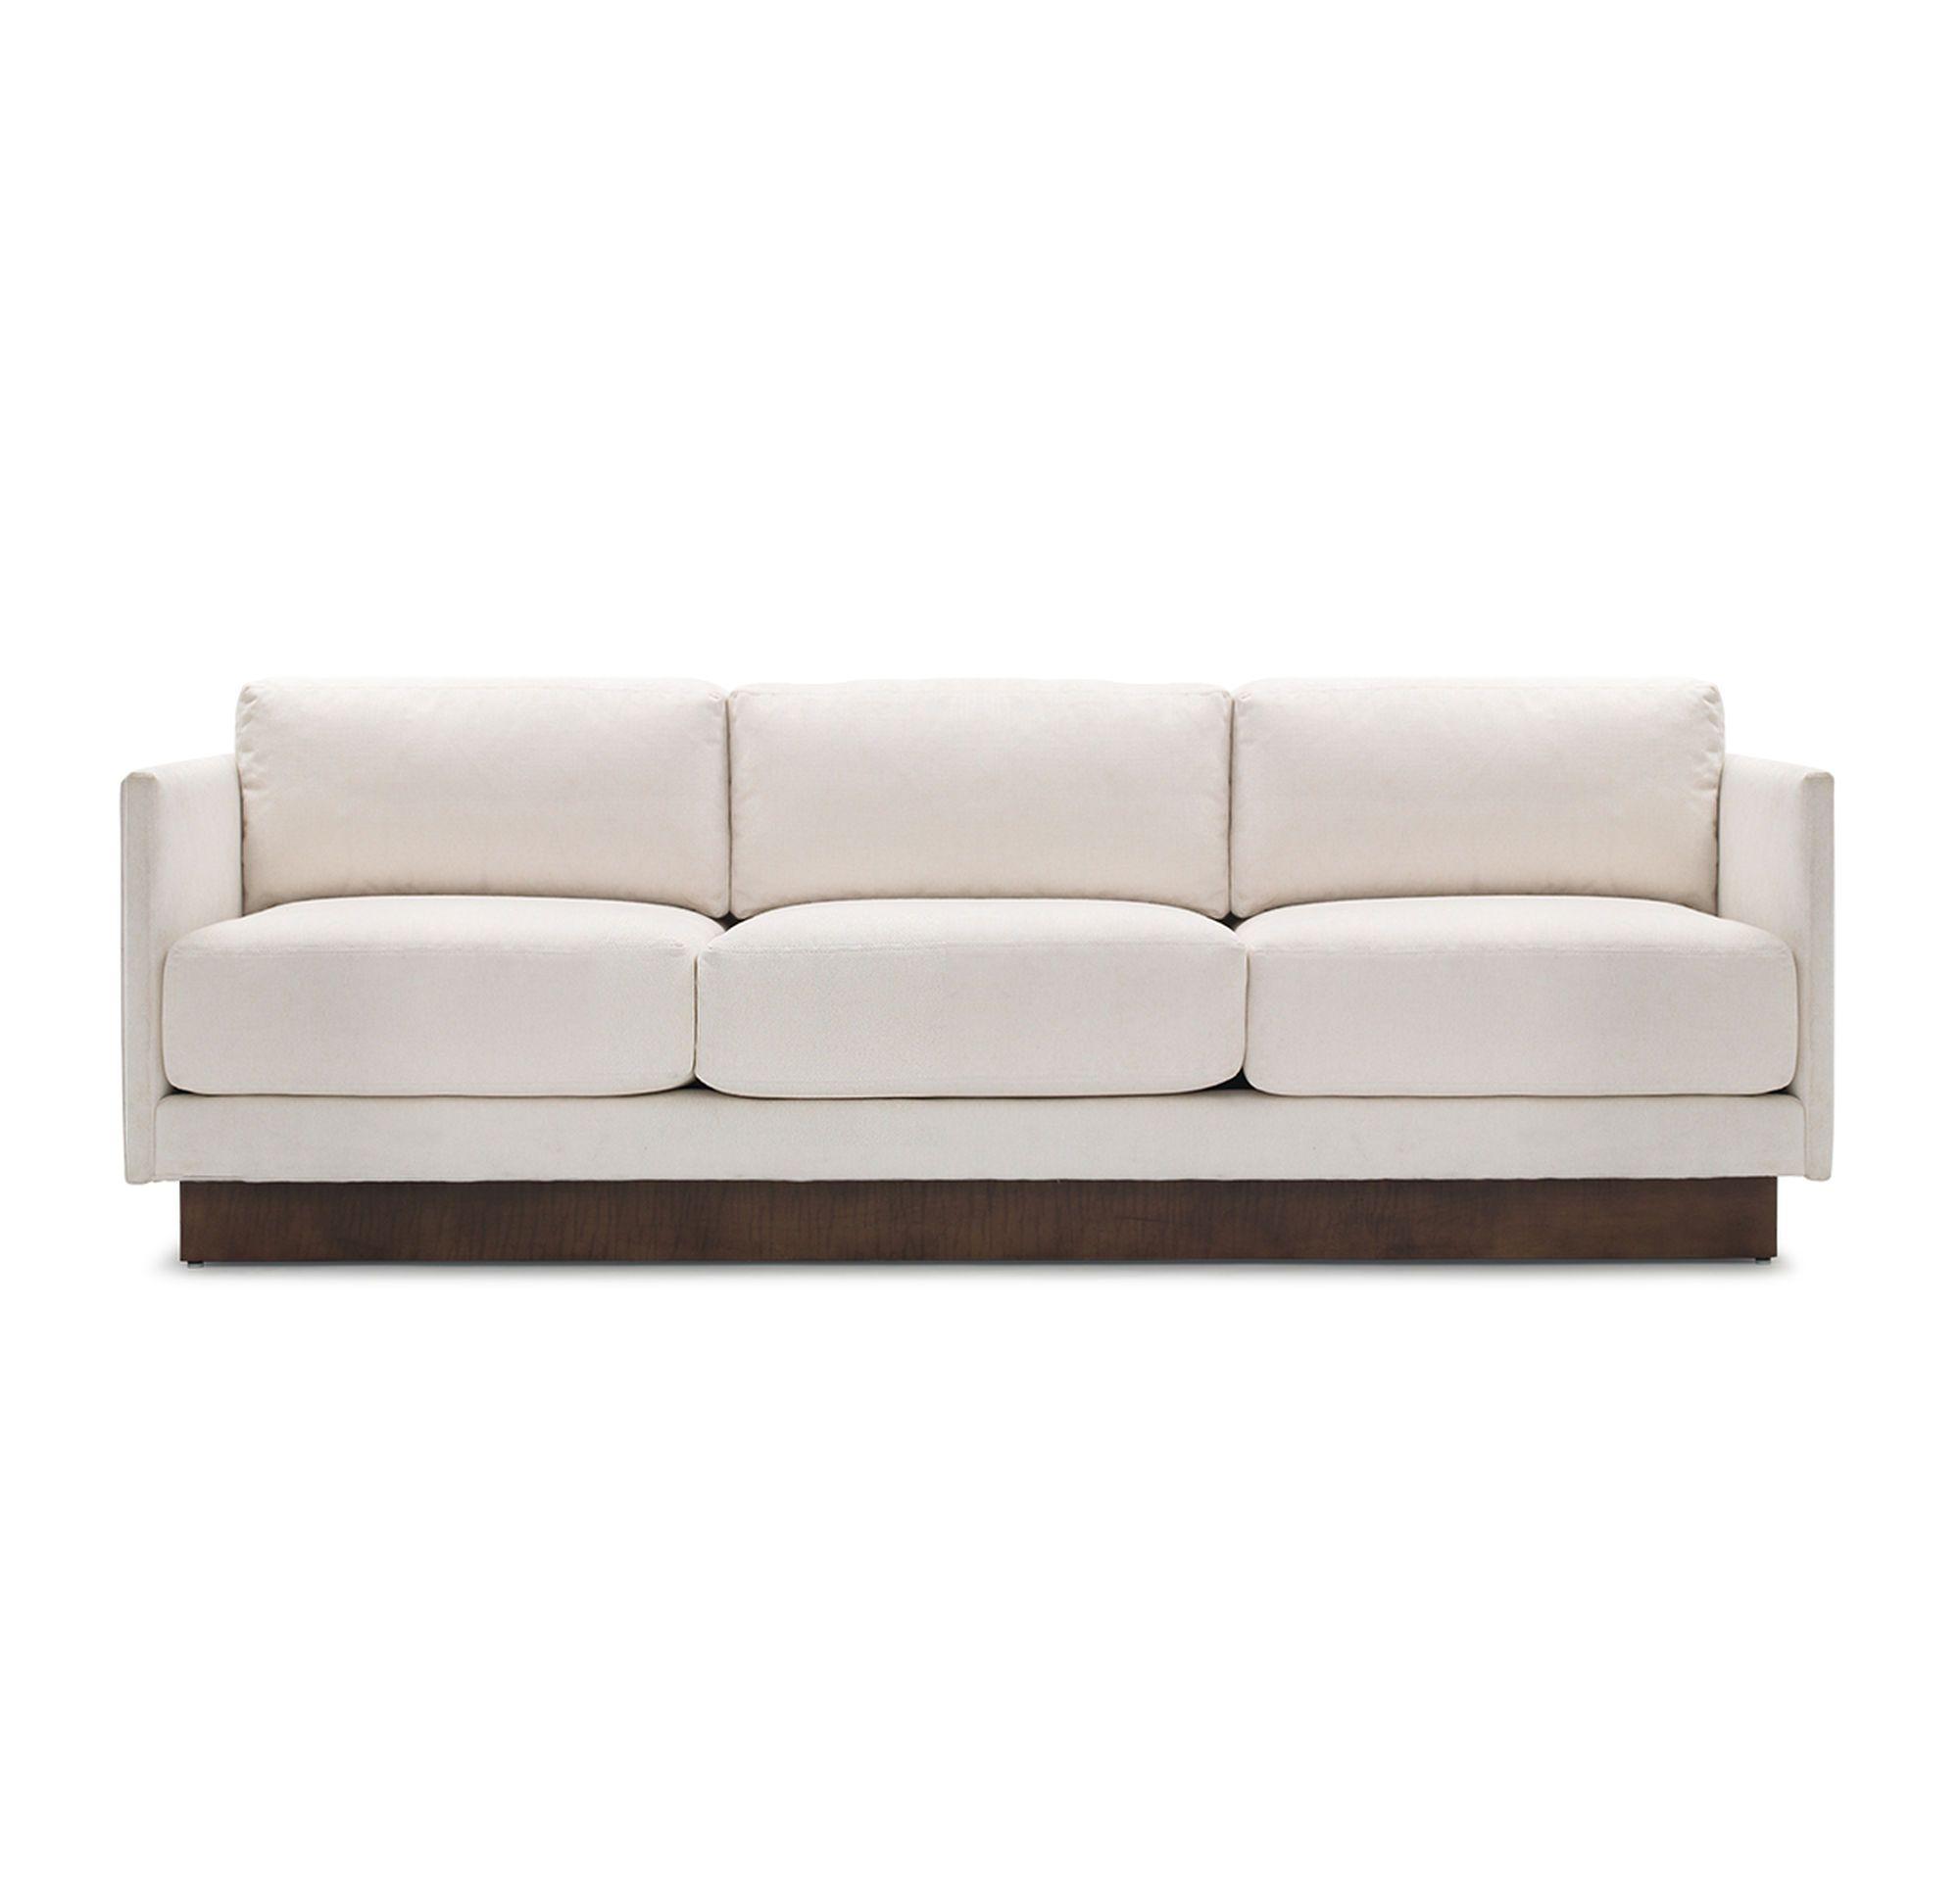 redford sofa cason white hi res vc office sofa living room rh pinterest com